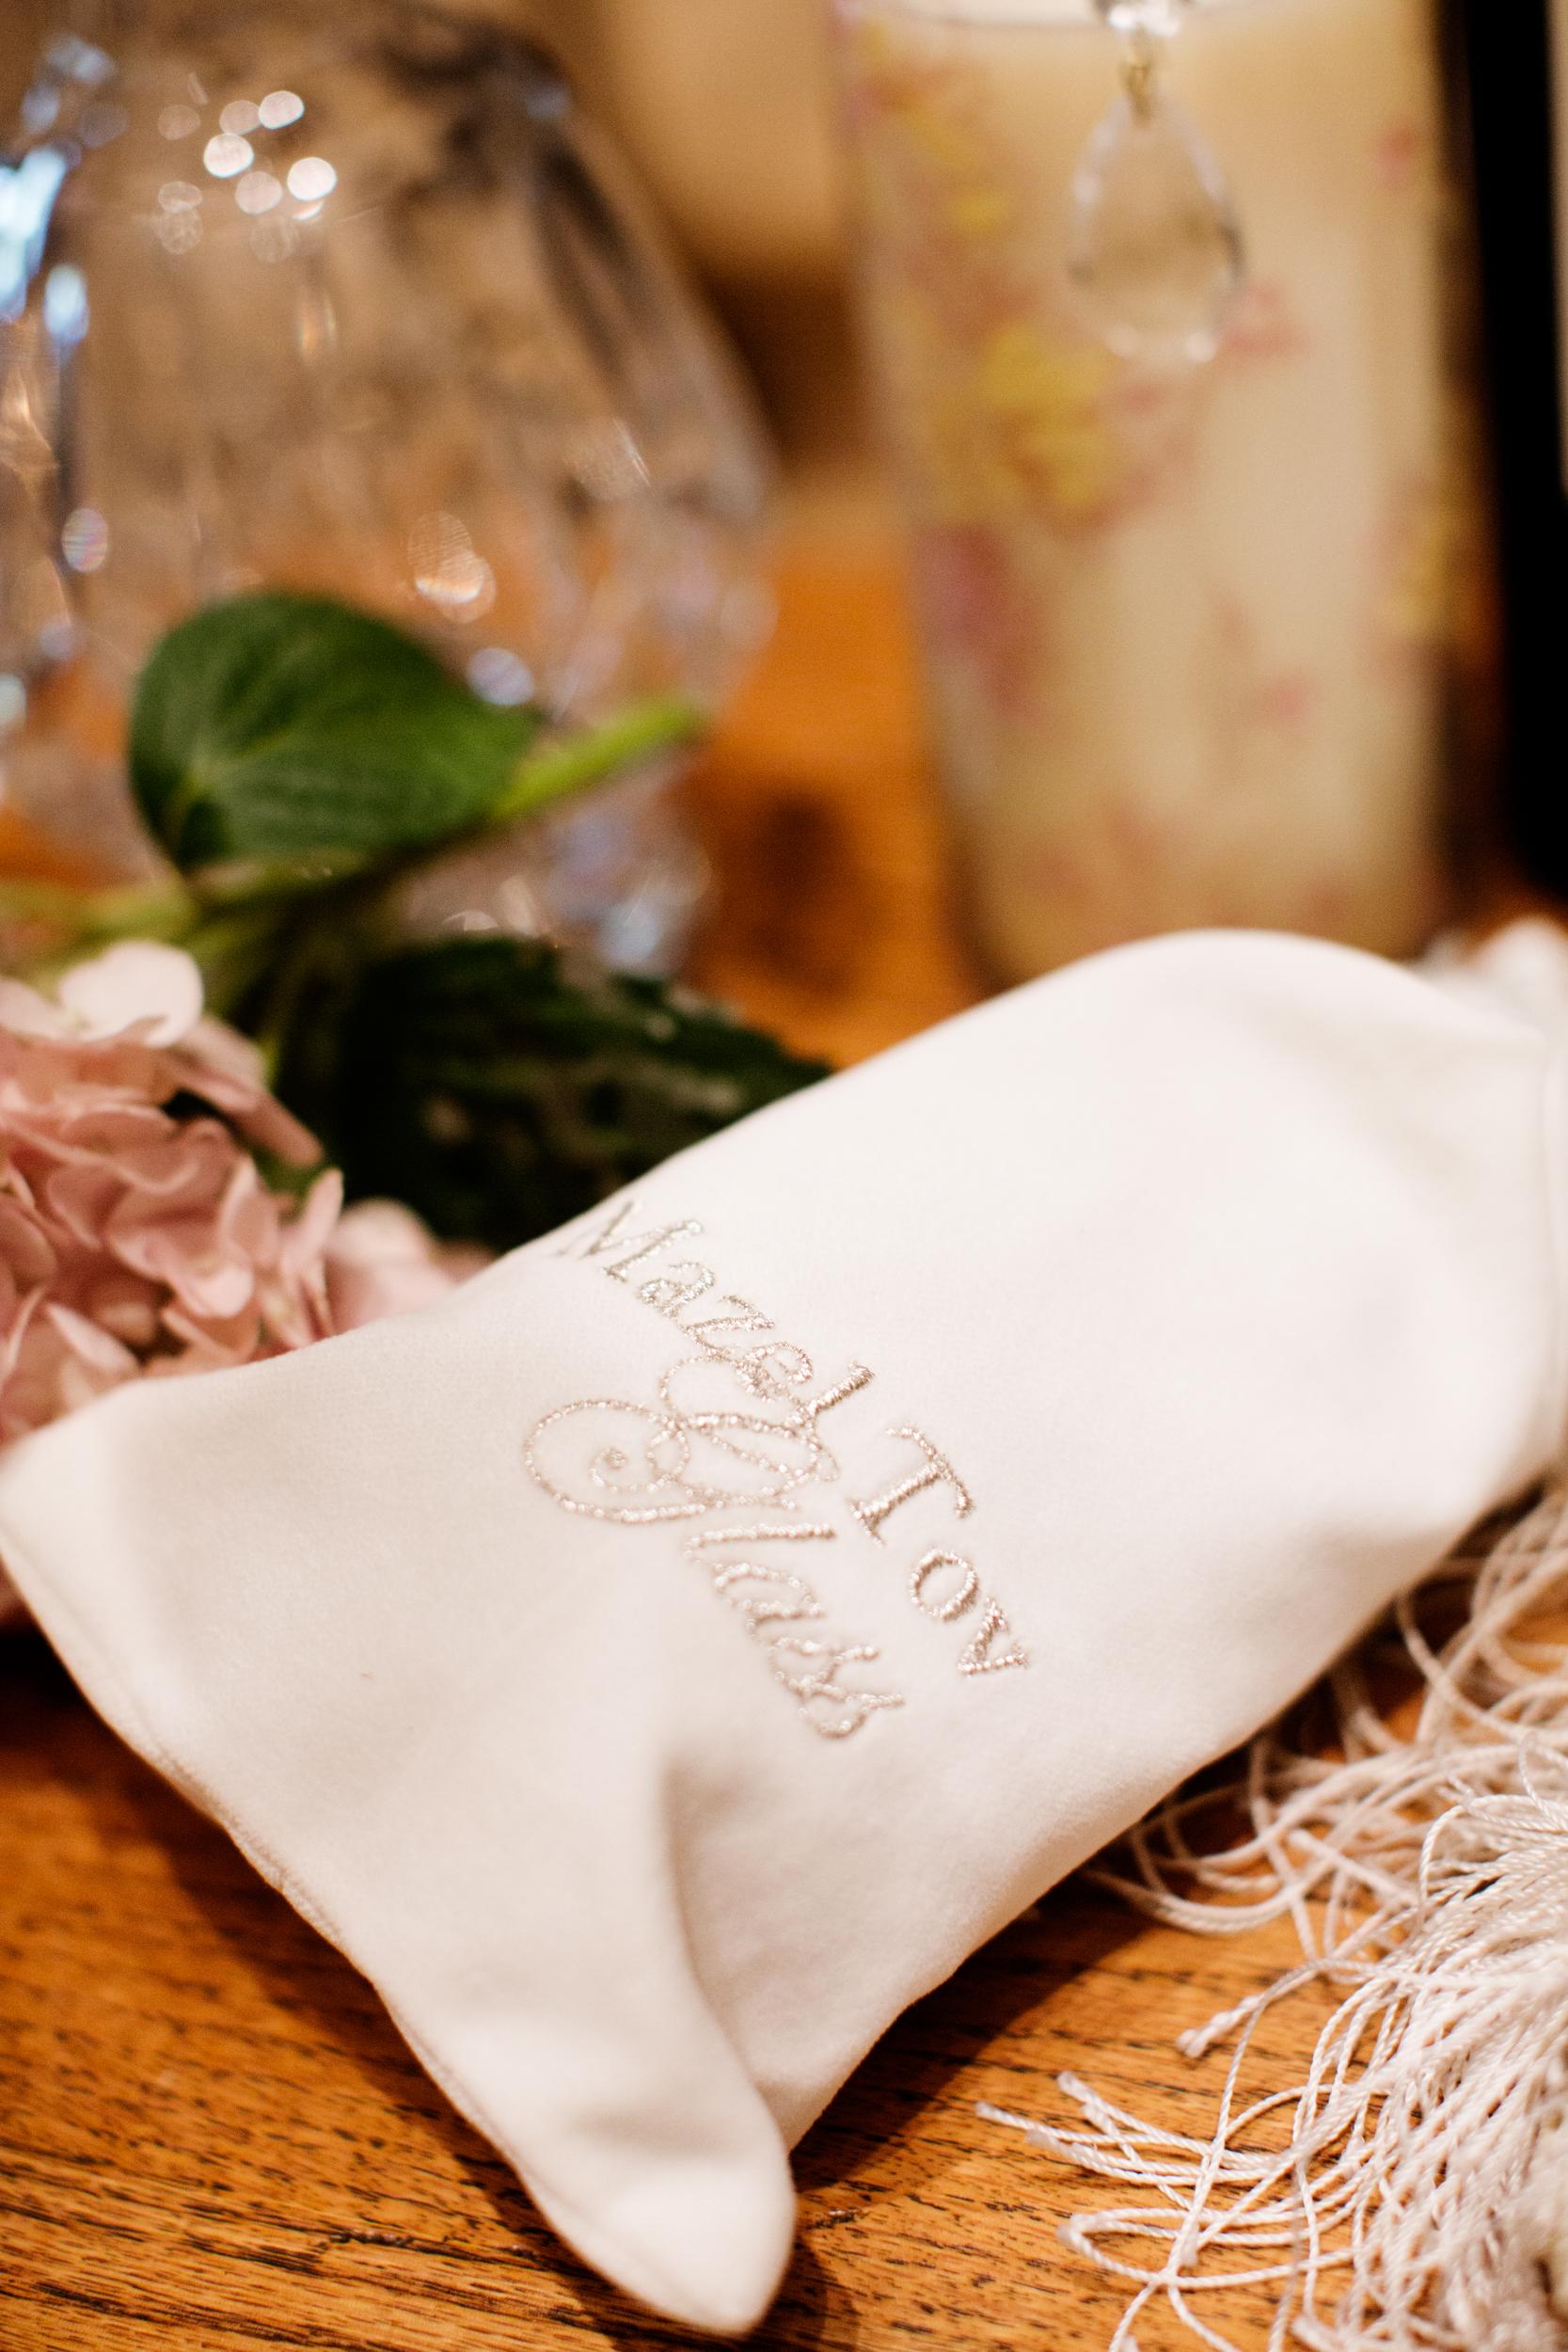 Ceci_New_York_Ceci_Style_Ceci_Johnson_Luxury_Lifestyle_Floral_Lace_Wedding_Letterpress_Inspiration_Design_Custom_Couture_Personalized_Invitations_-80.jpg